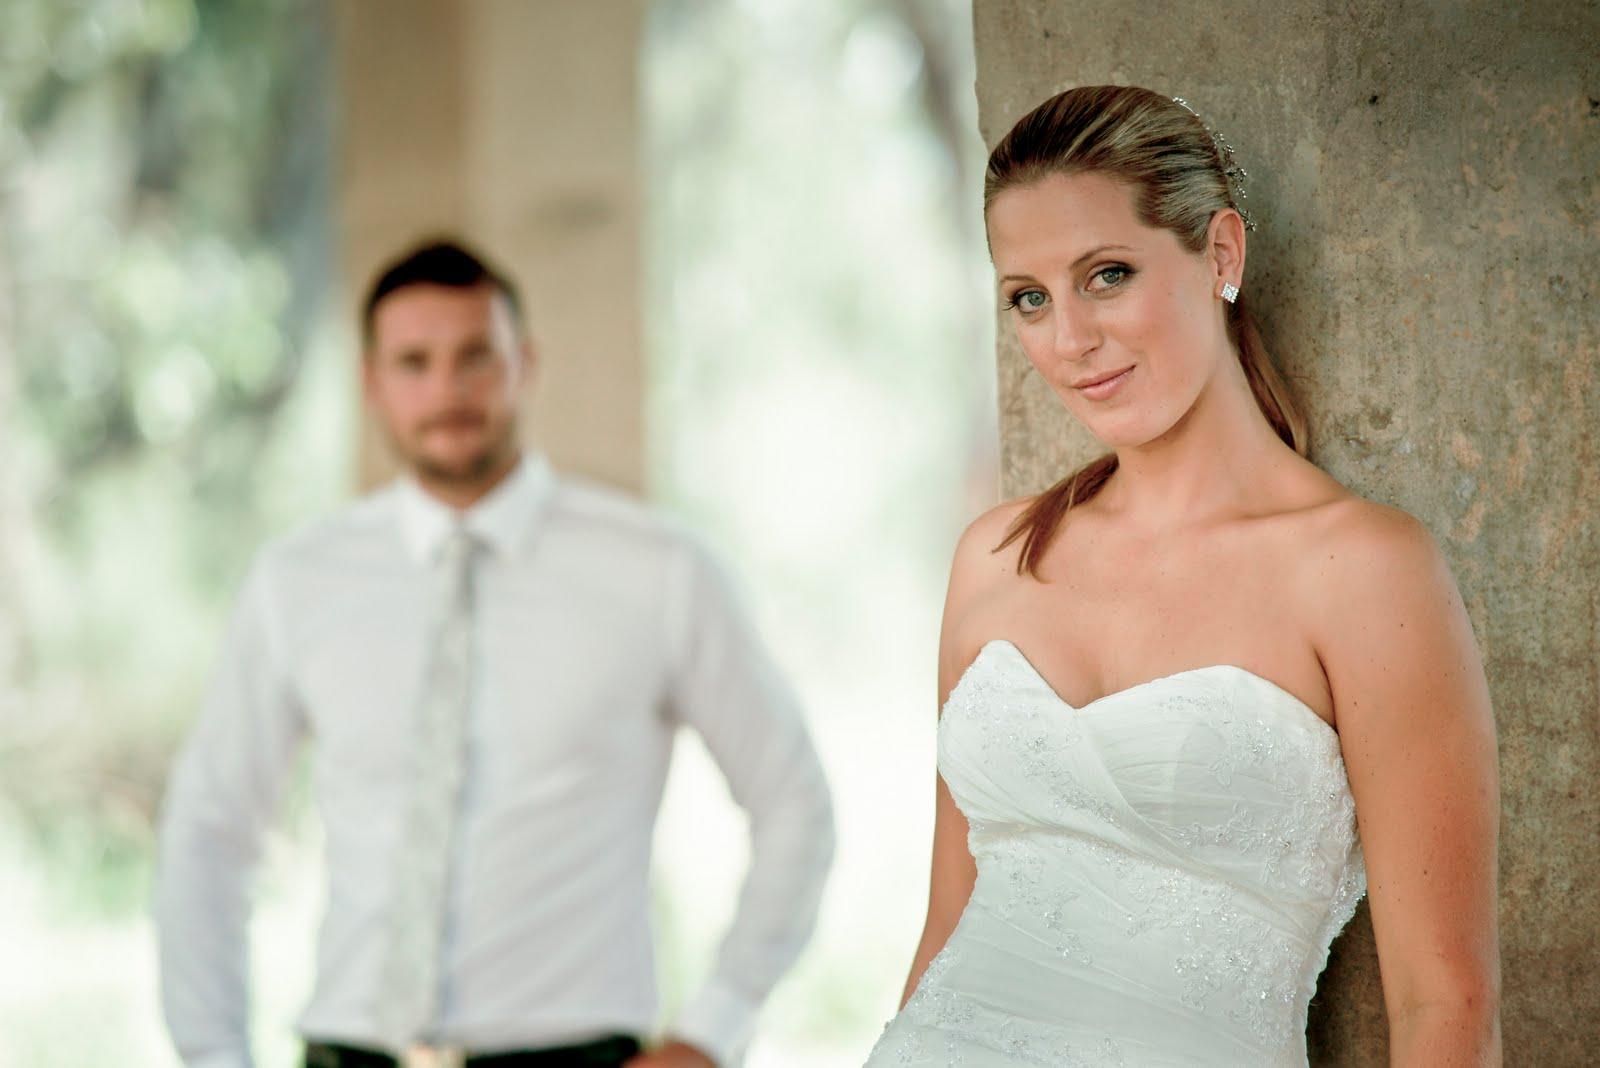 sublime - mobile hair and makeup for weddings: belinda